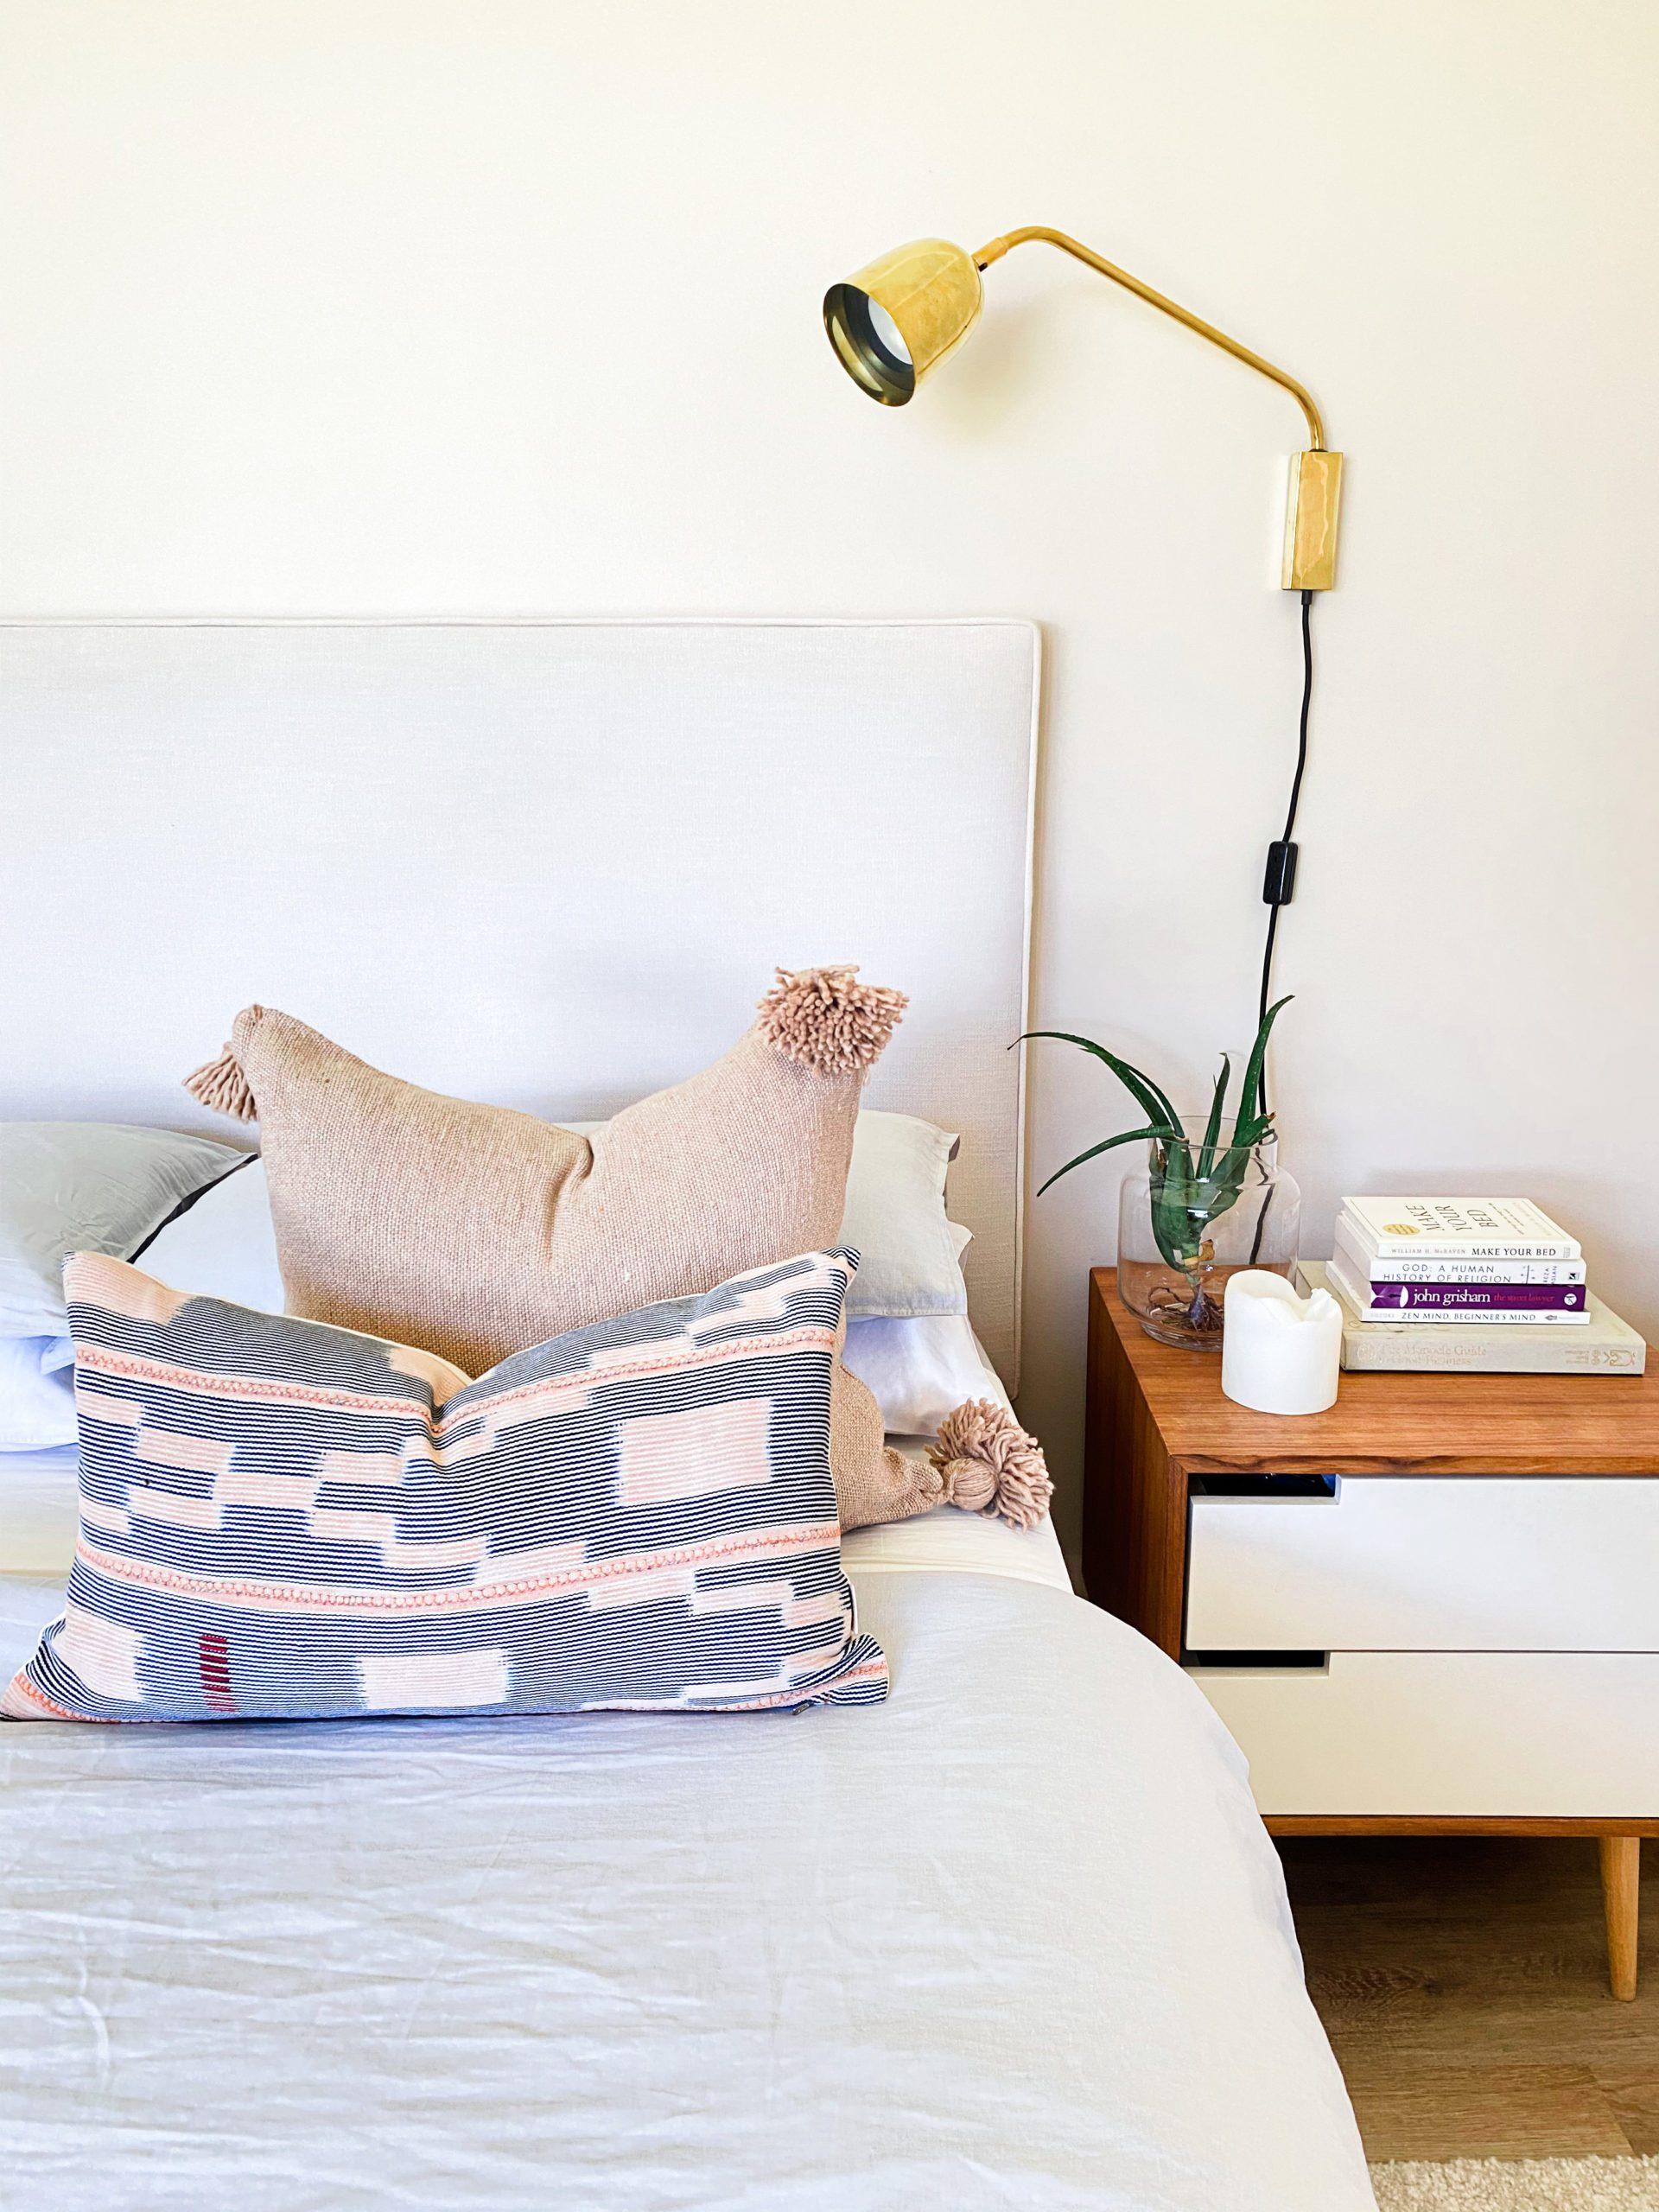 Baule pillow mudcloth throw pillow indigo Spases Moroccan Pom Pom pillow